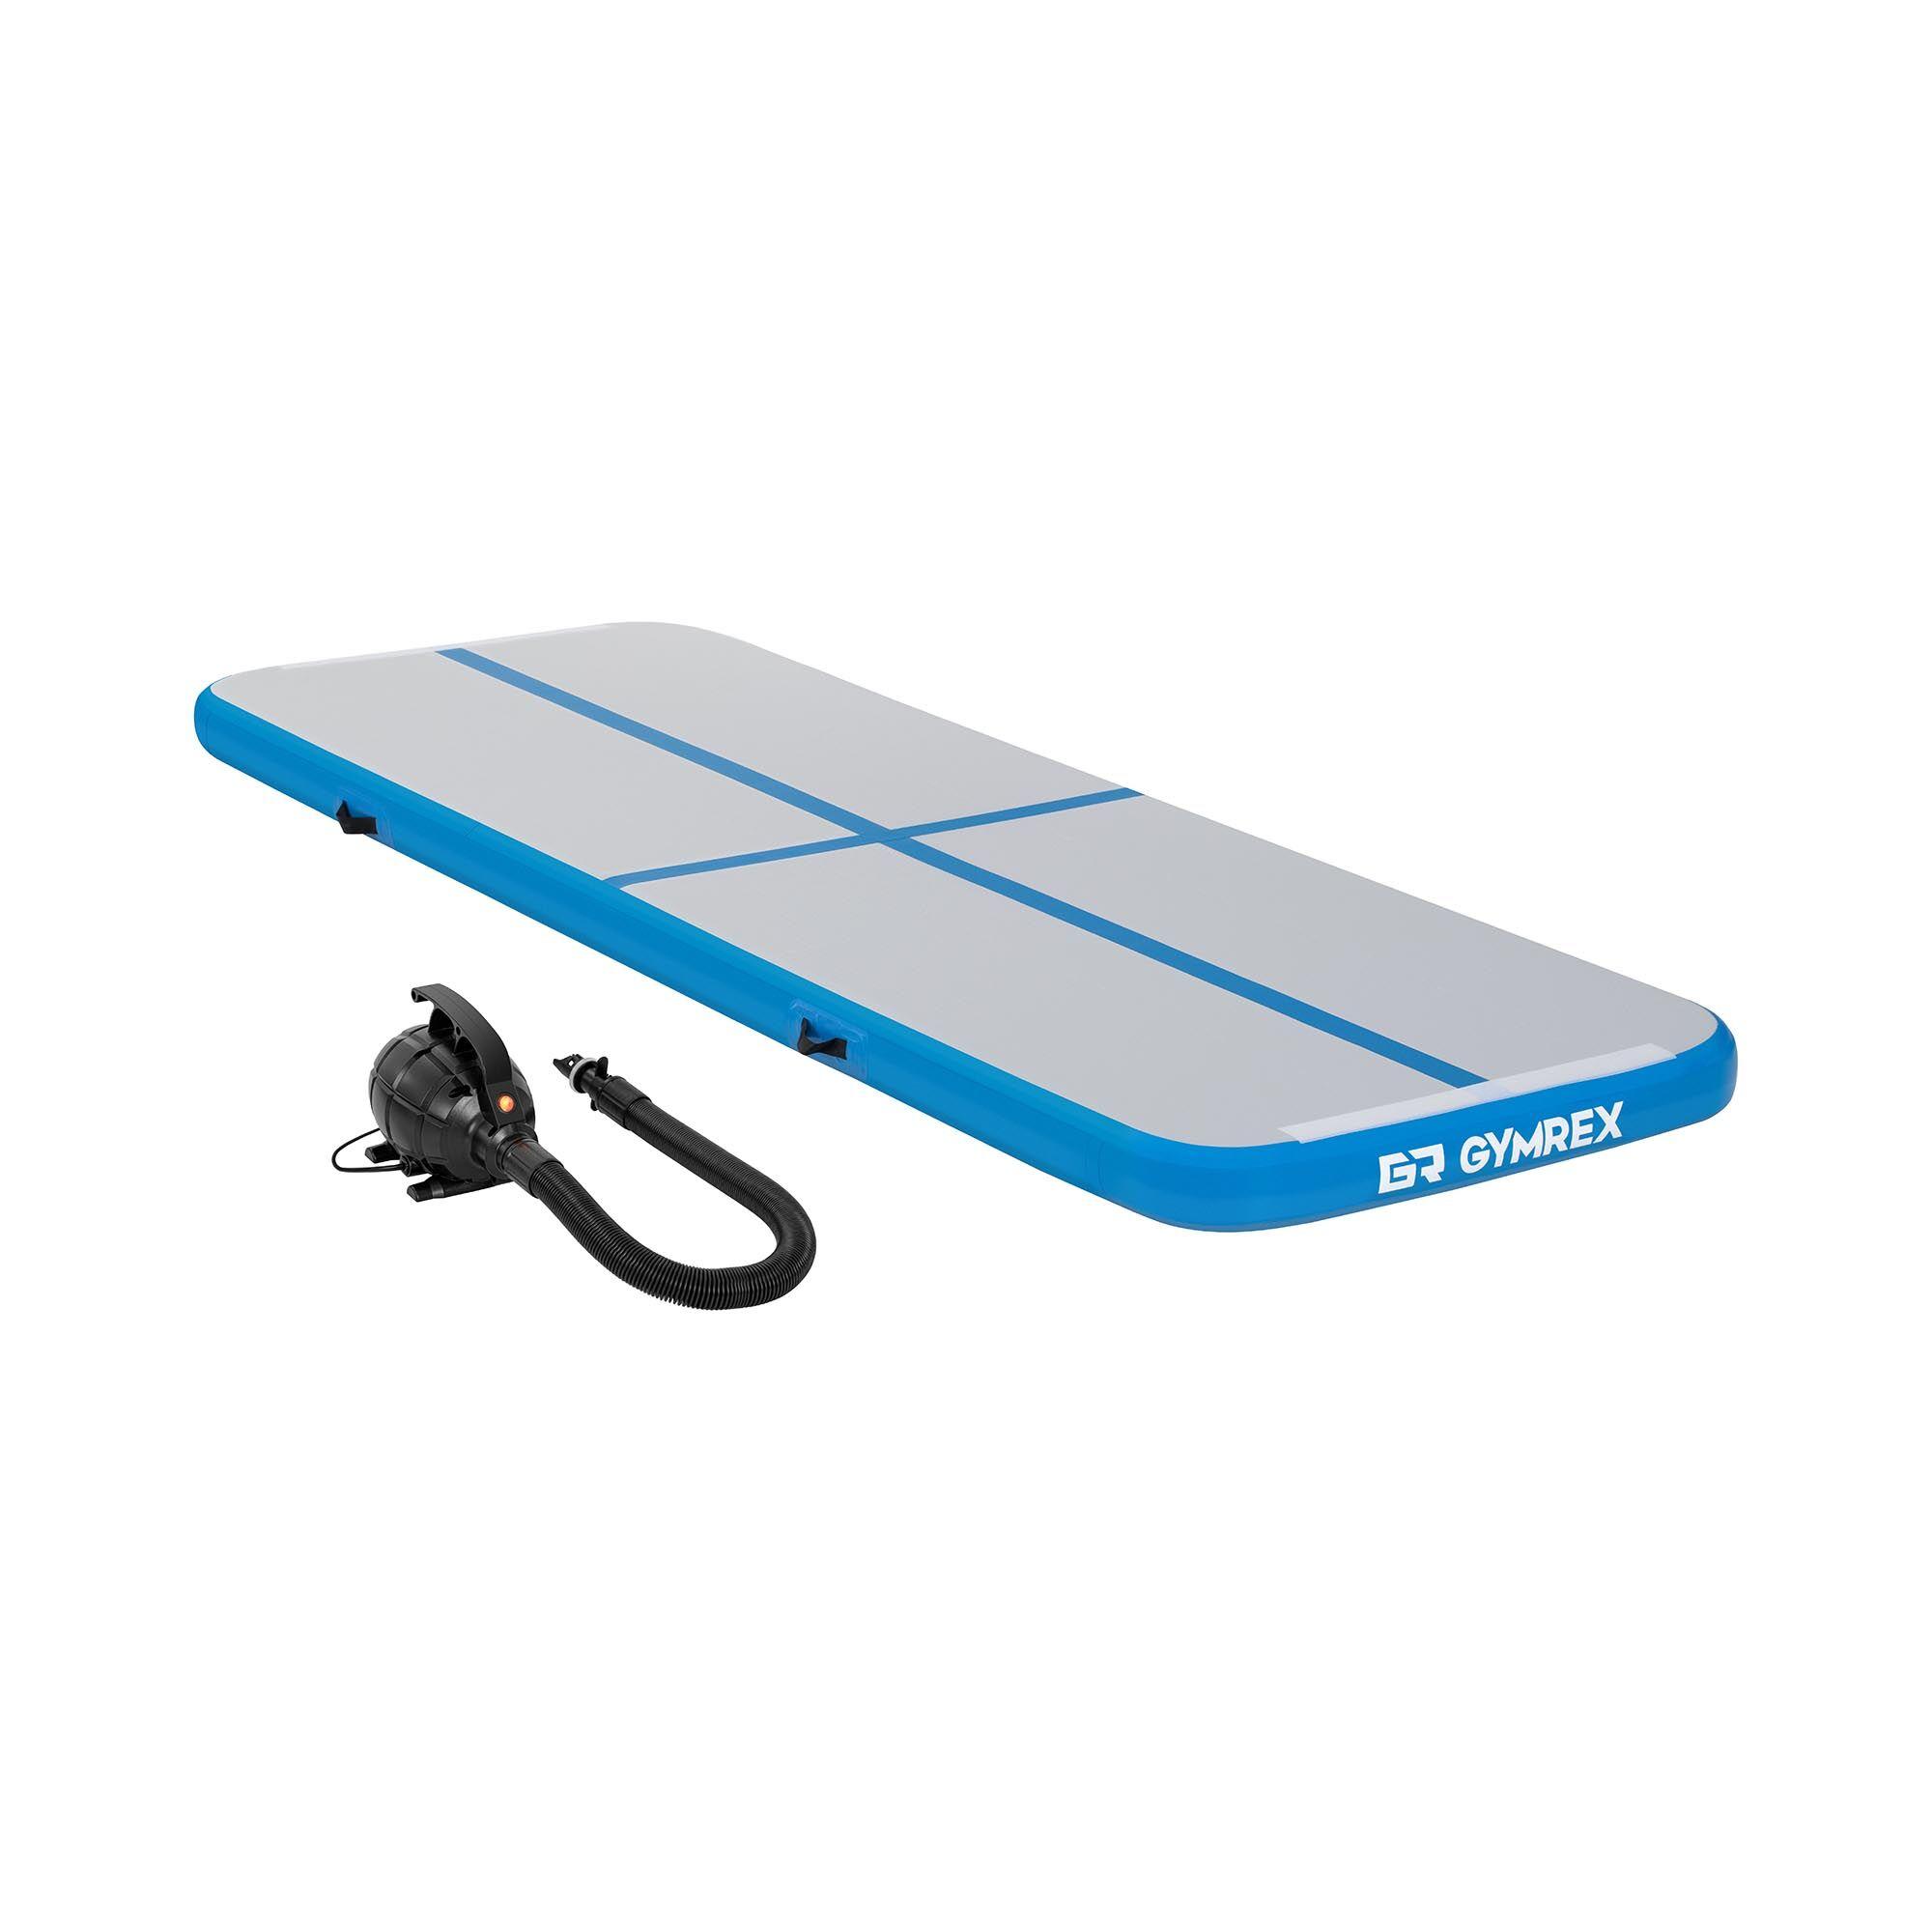 Gymrex Set Aufblasbare Turnmatte - Airtrack inklusive Luftpumpe - 300 x 100 x 10 cm - 150 kg - blau/grau GR-ATM1-SET